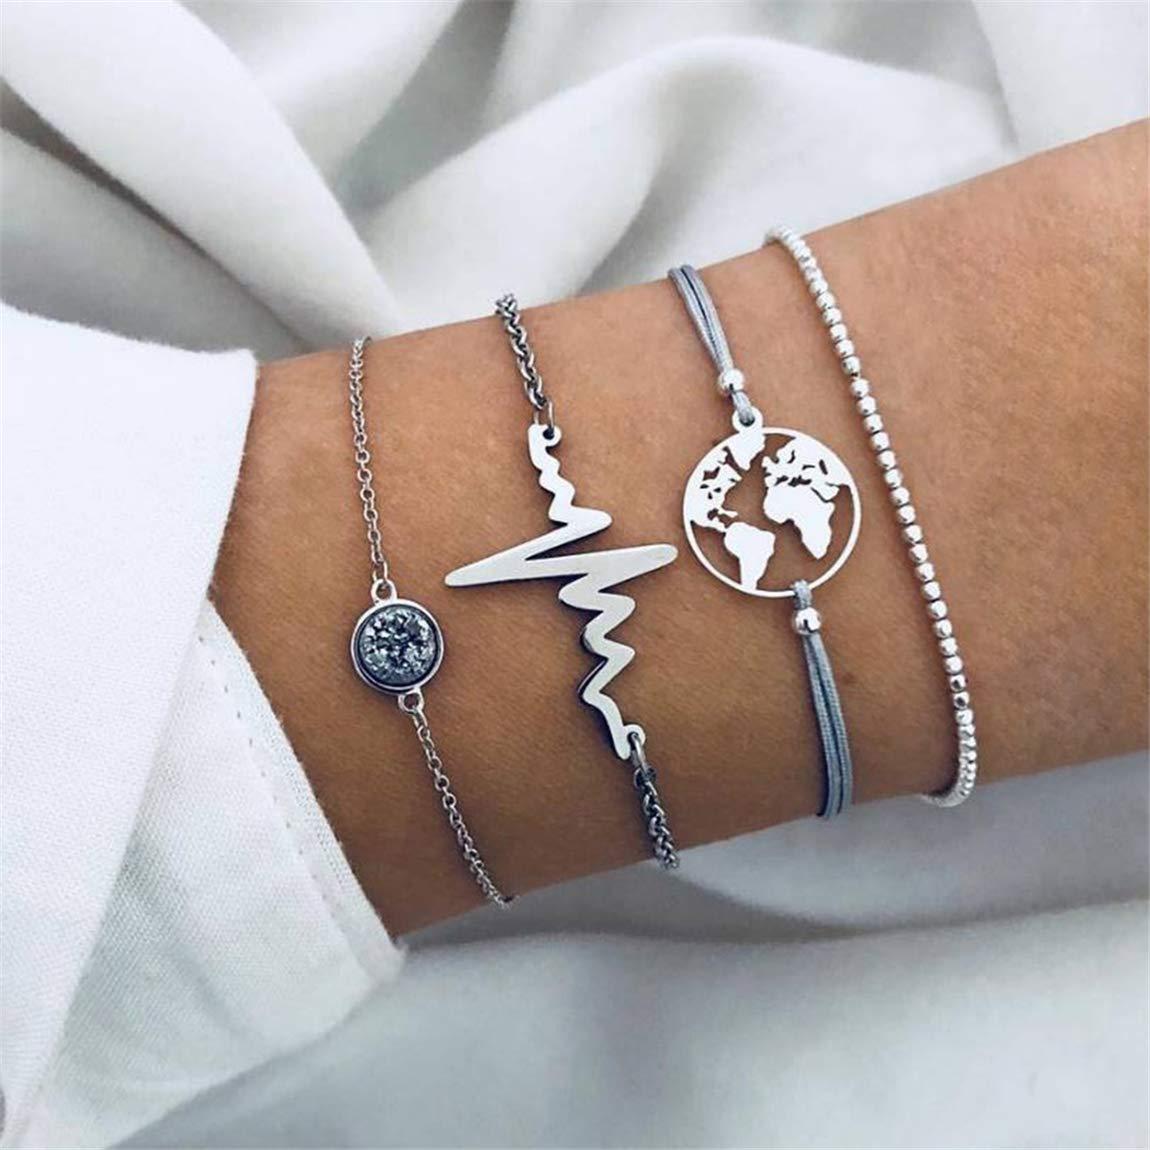 Weiy 4 Stücke Kreative Stilvolle Kristall Herzschlag ECG Weltkarte Design Armband Set Fashion Charming Splitter Perle Armreif Schmuck Zubehör